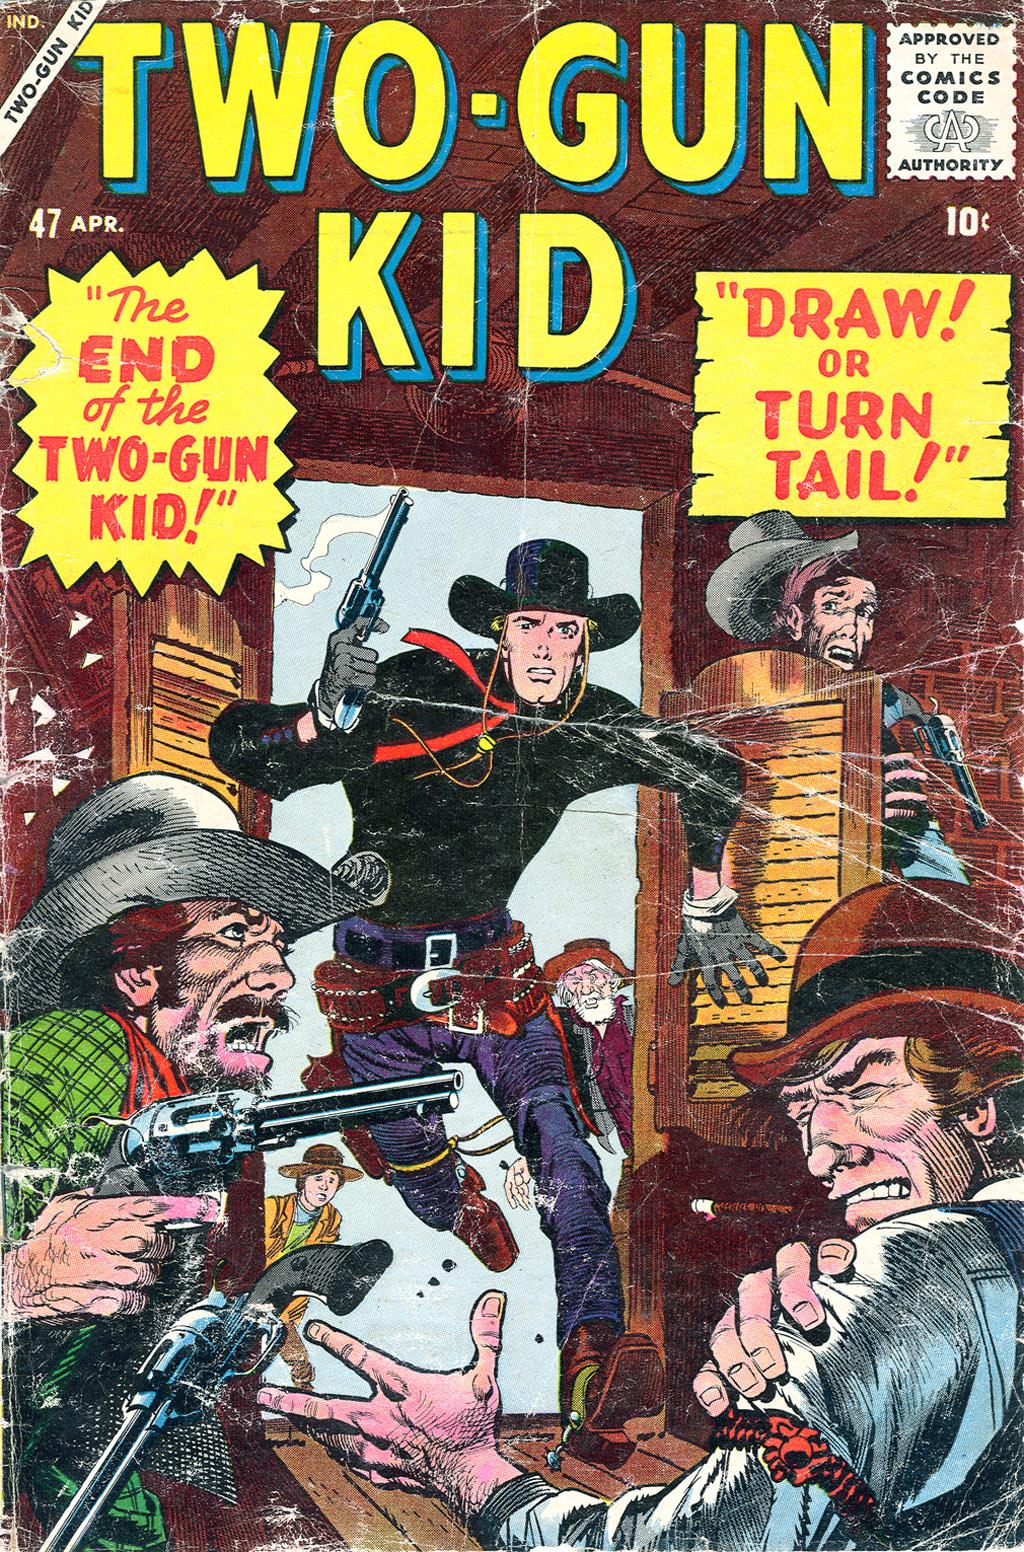 Read online Two-Gun Kid comic -  Issue #47 - 1